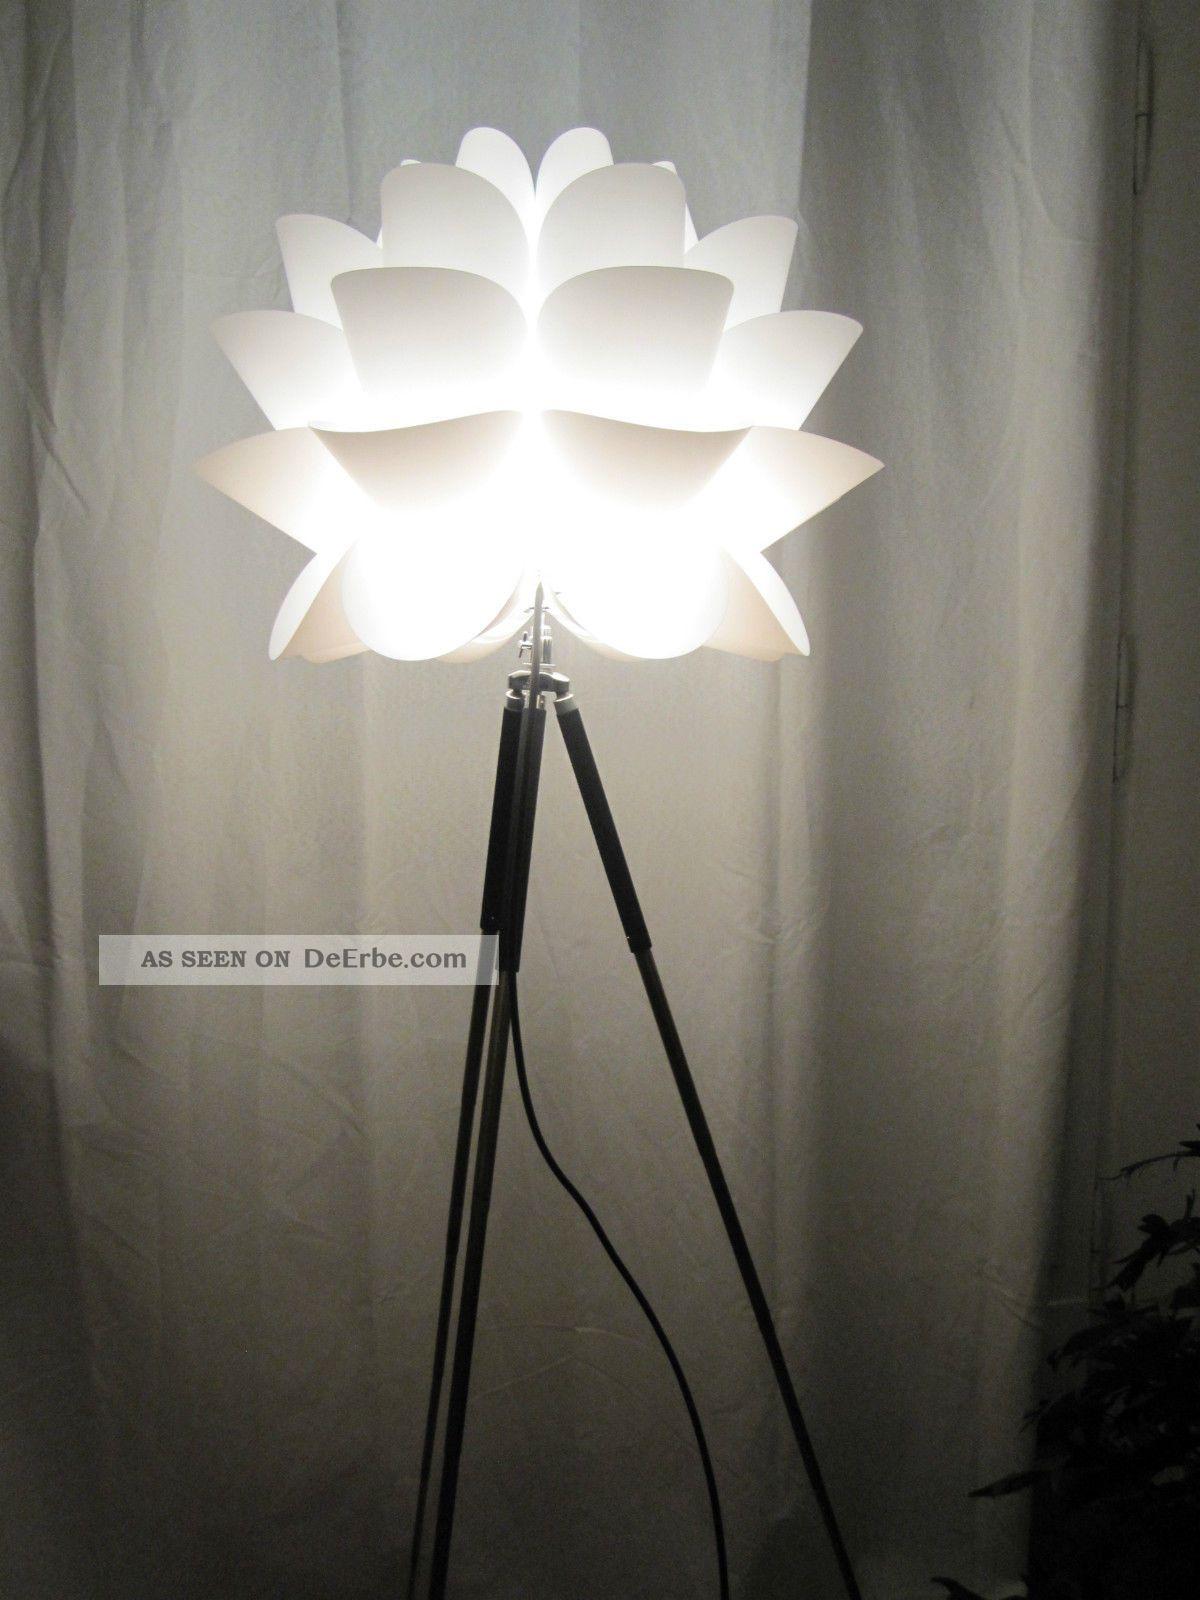 tripod loft steh lampe leuchte art deco bauhaus stativ 1960 1970 retro. Black Bedroom Furniture Sets. Home Design Ideas